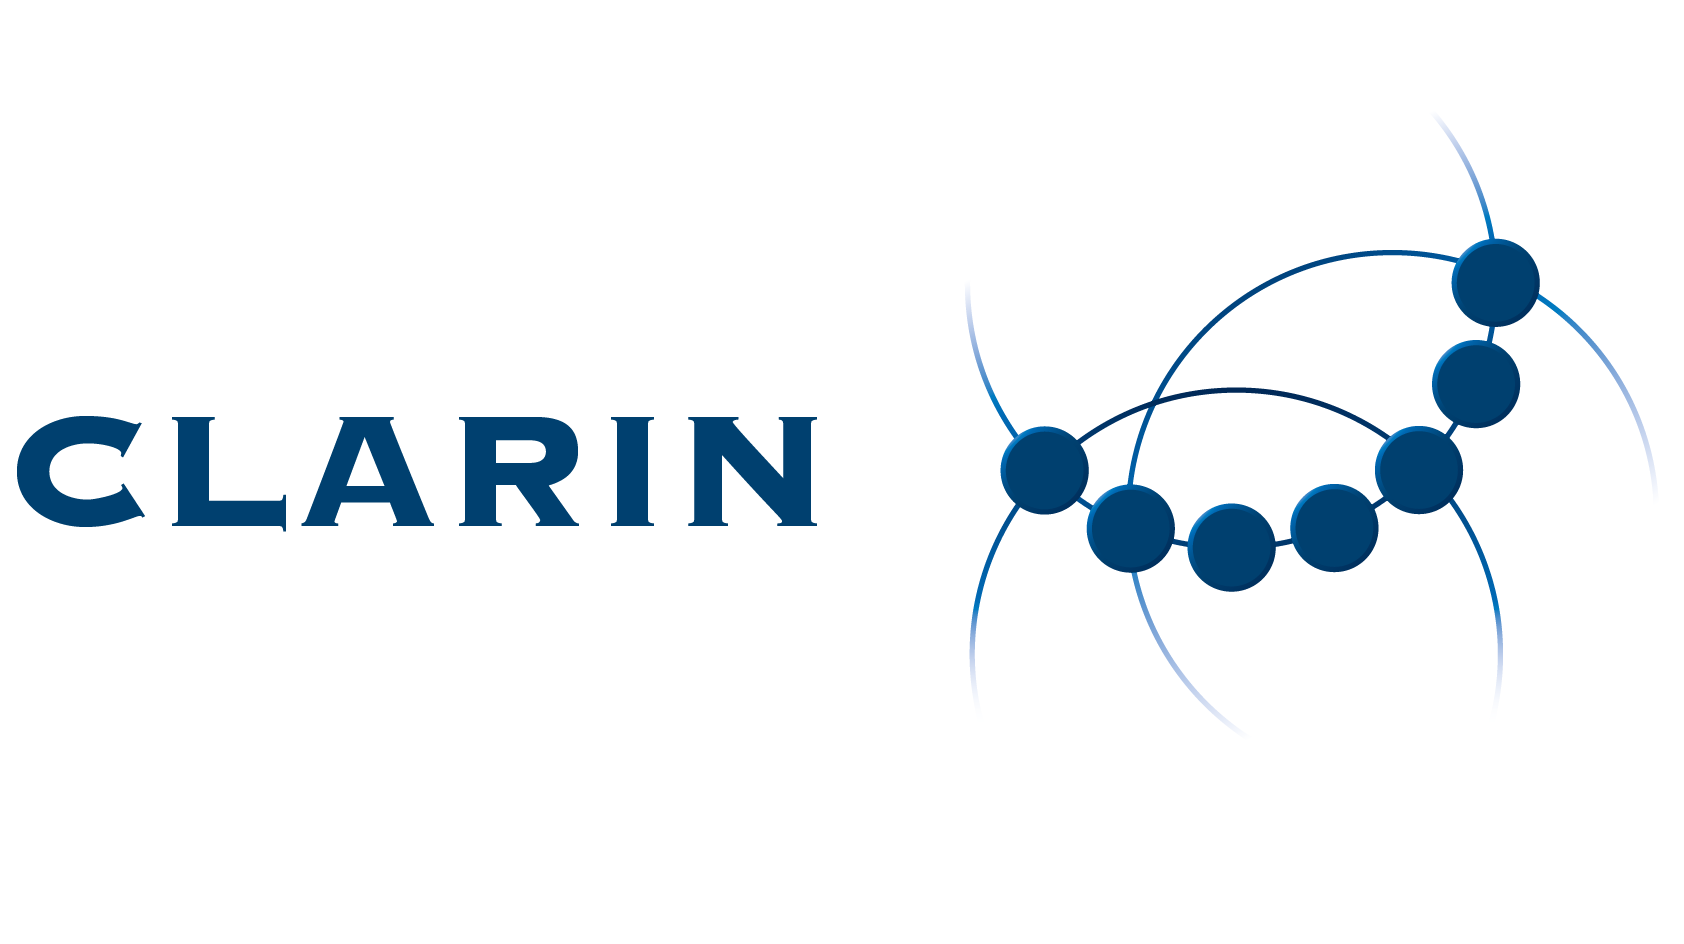 CLARIN Centre Registry.